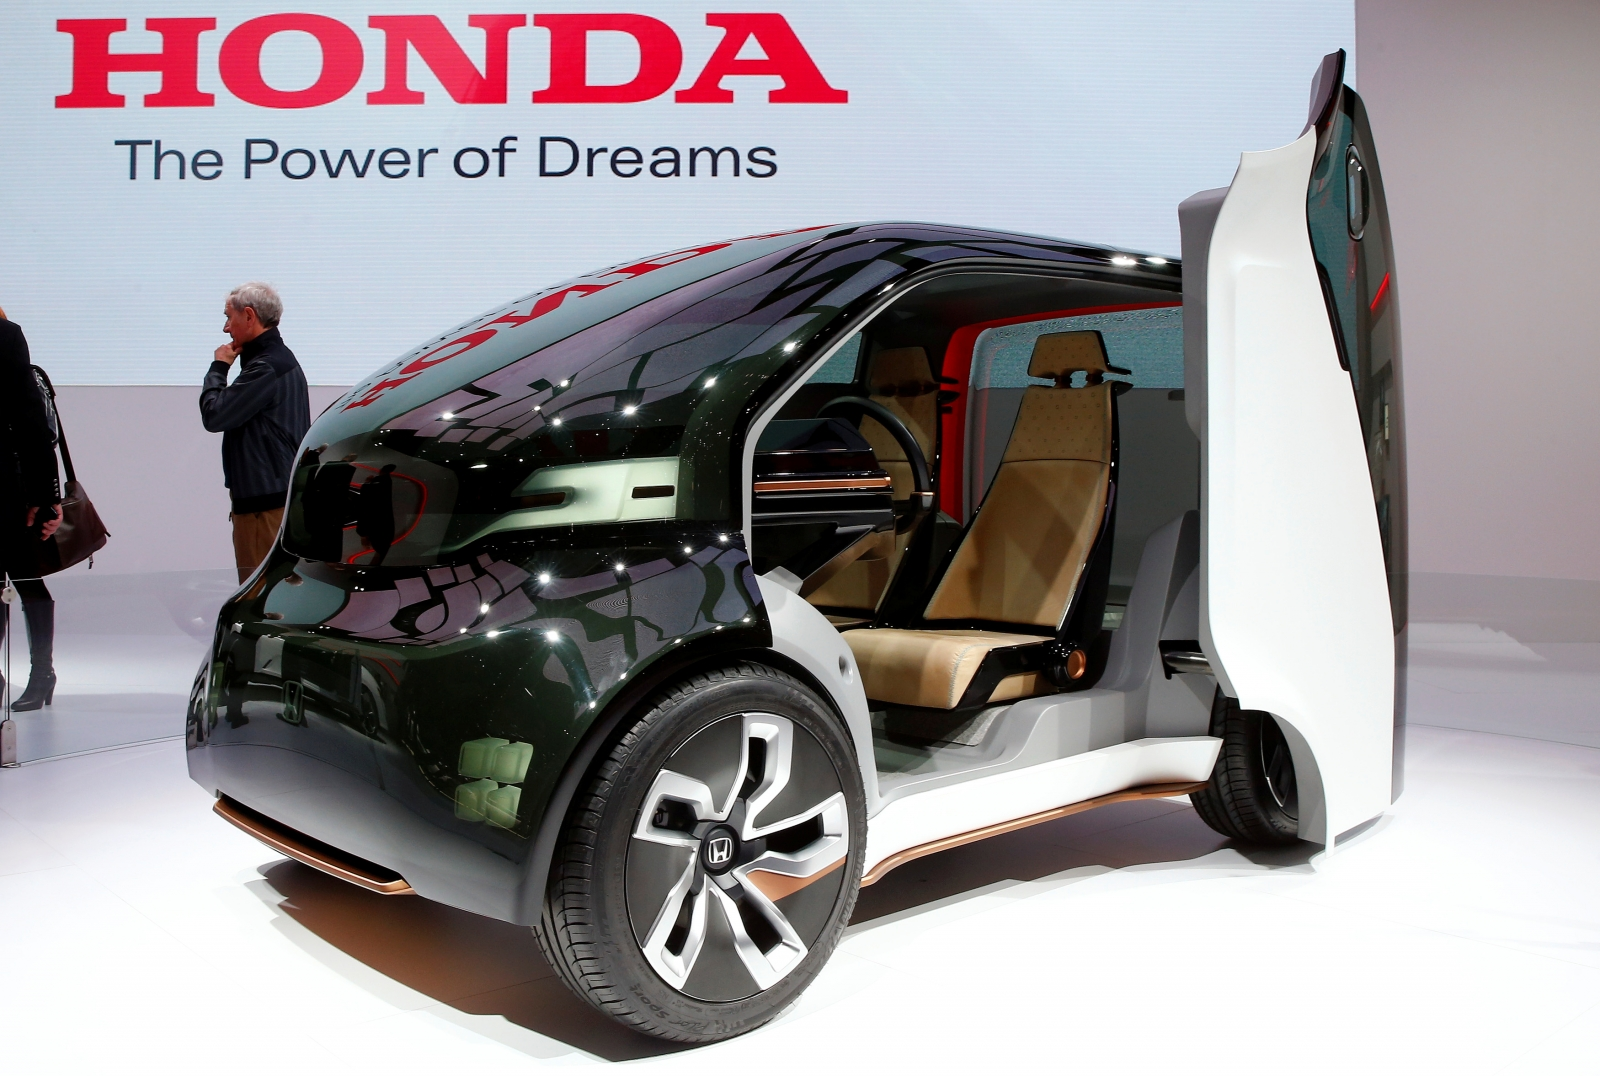 Honda Neuv concept car